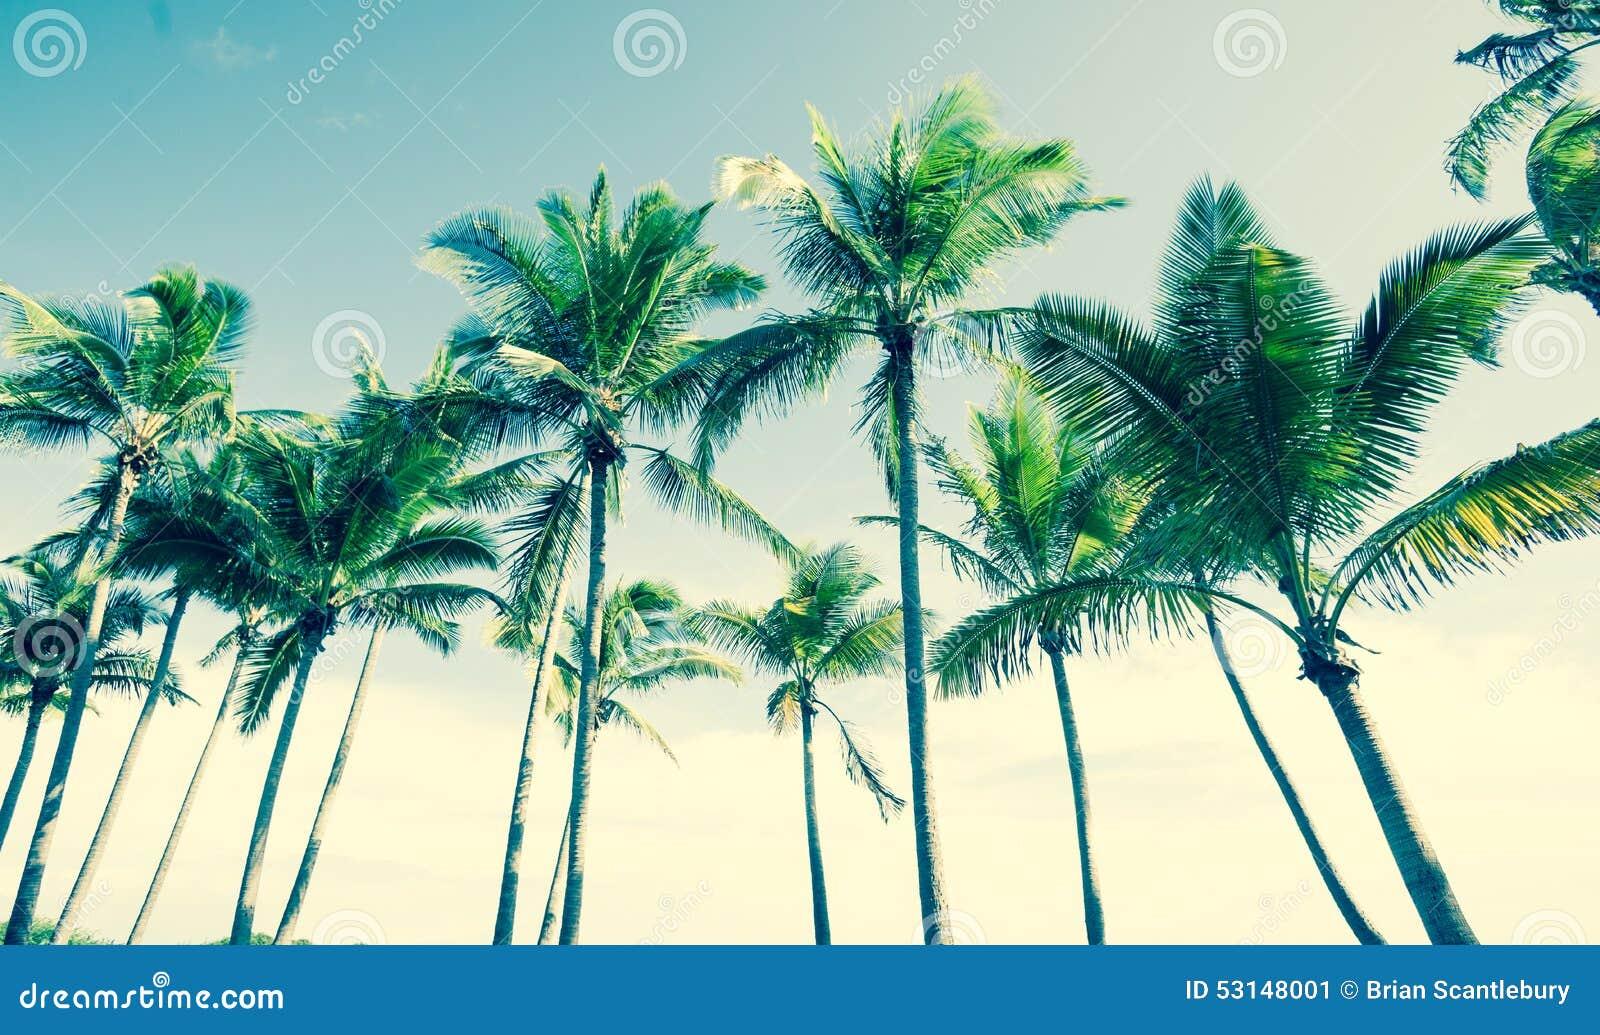 Tropical vintage palm image.